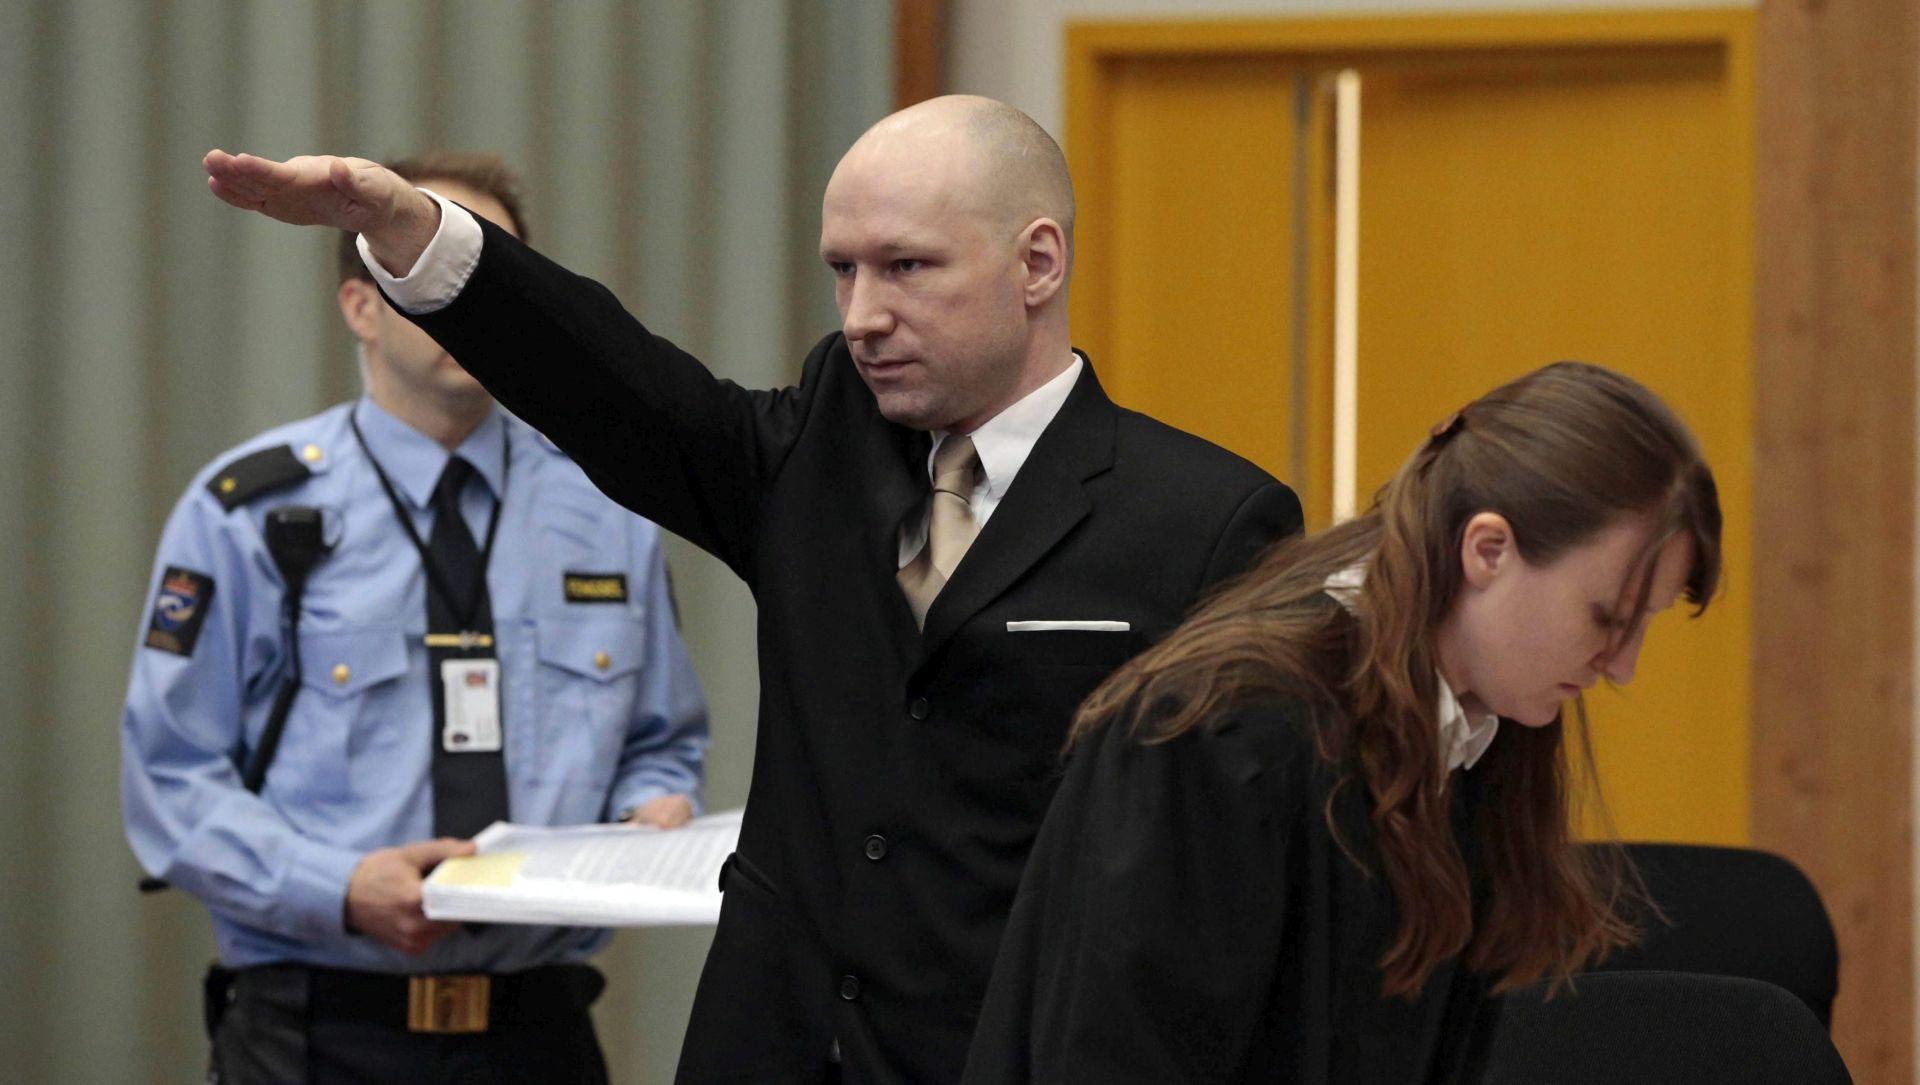 NORVEŠKI MONSTRUM TUŽI DRŽAVU Breivik uz nacistički pozdrav stigao na ročište